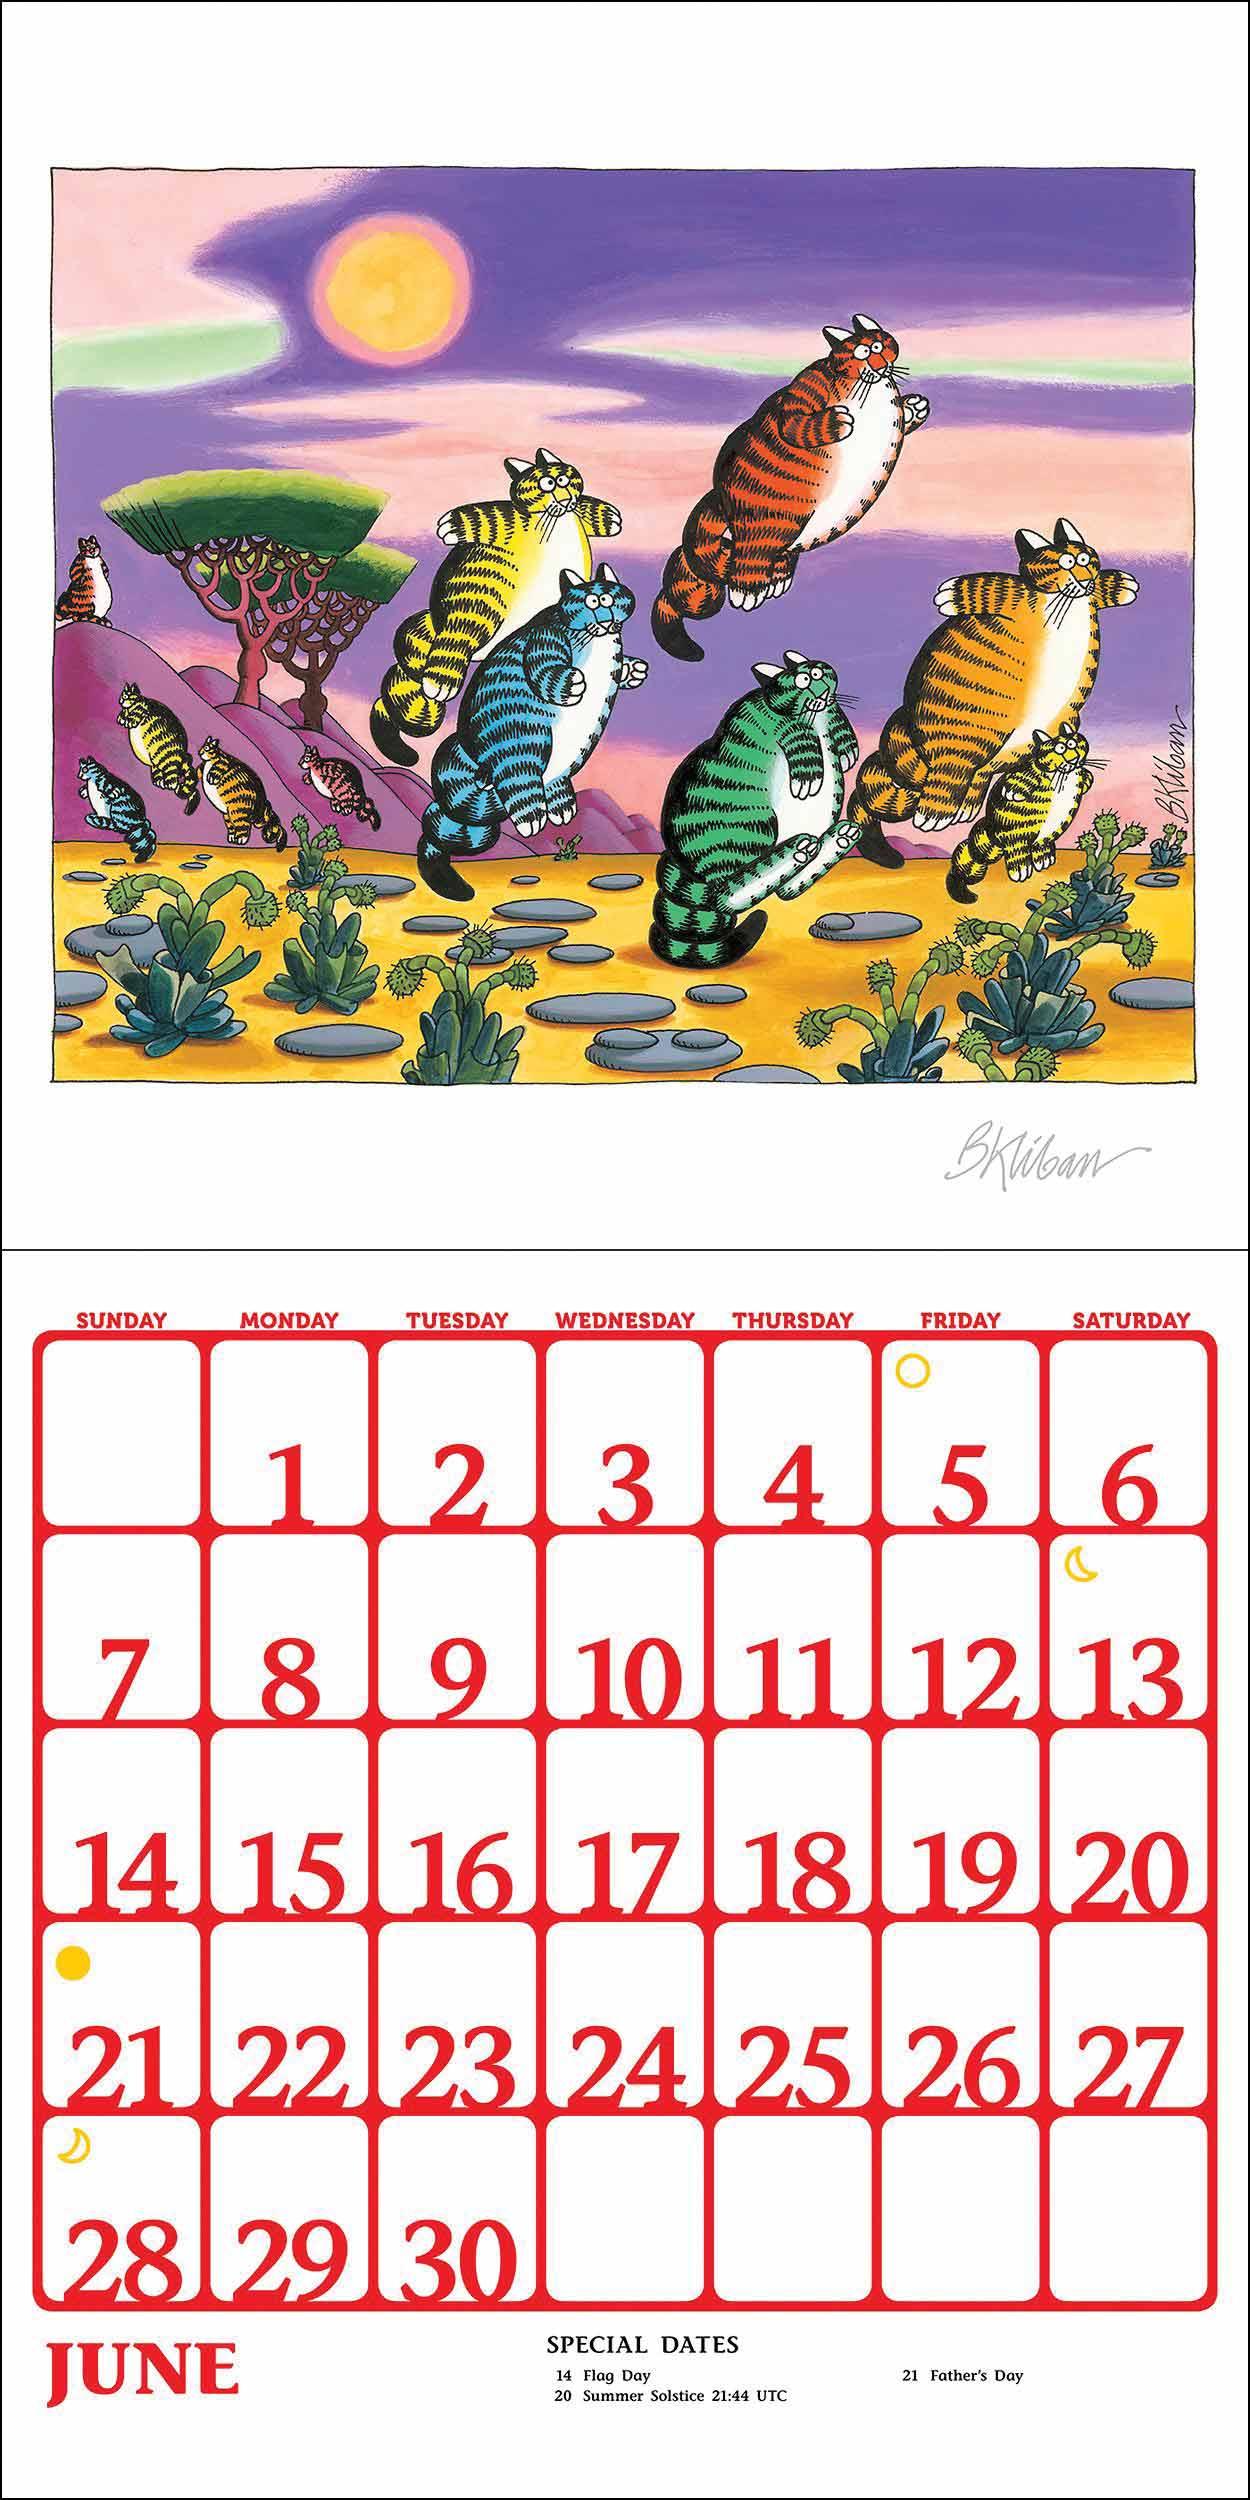 B Kliban Cat Stickers Calendar 2020